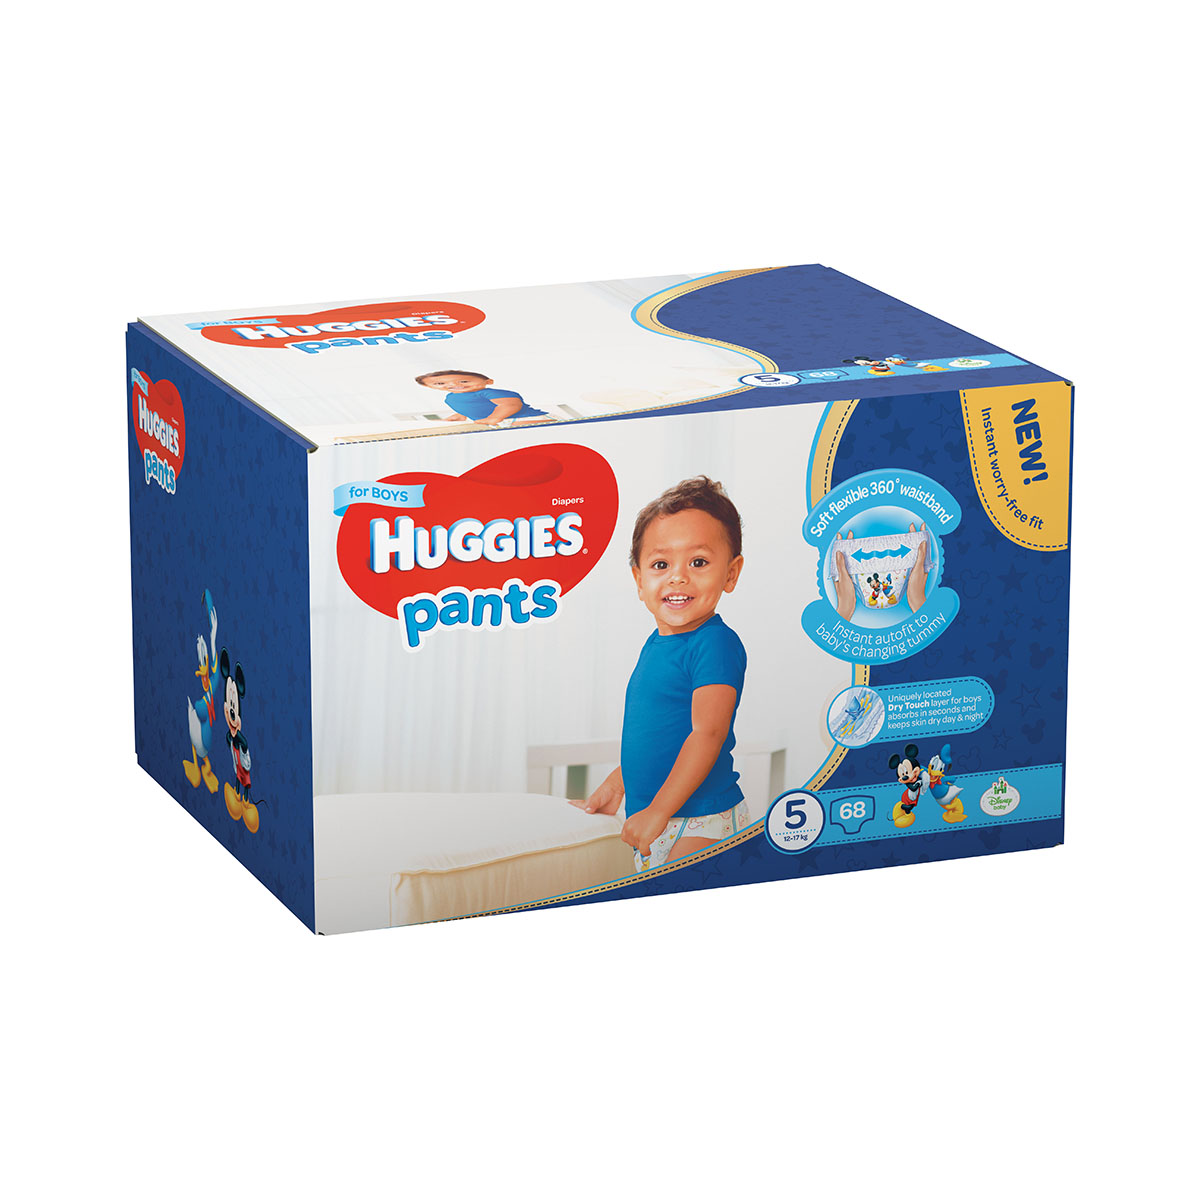 Scutece Huggies Pants Box Boys, Nr 5, 12 - 17 Kg, 68 buc imagine